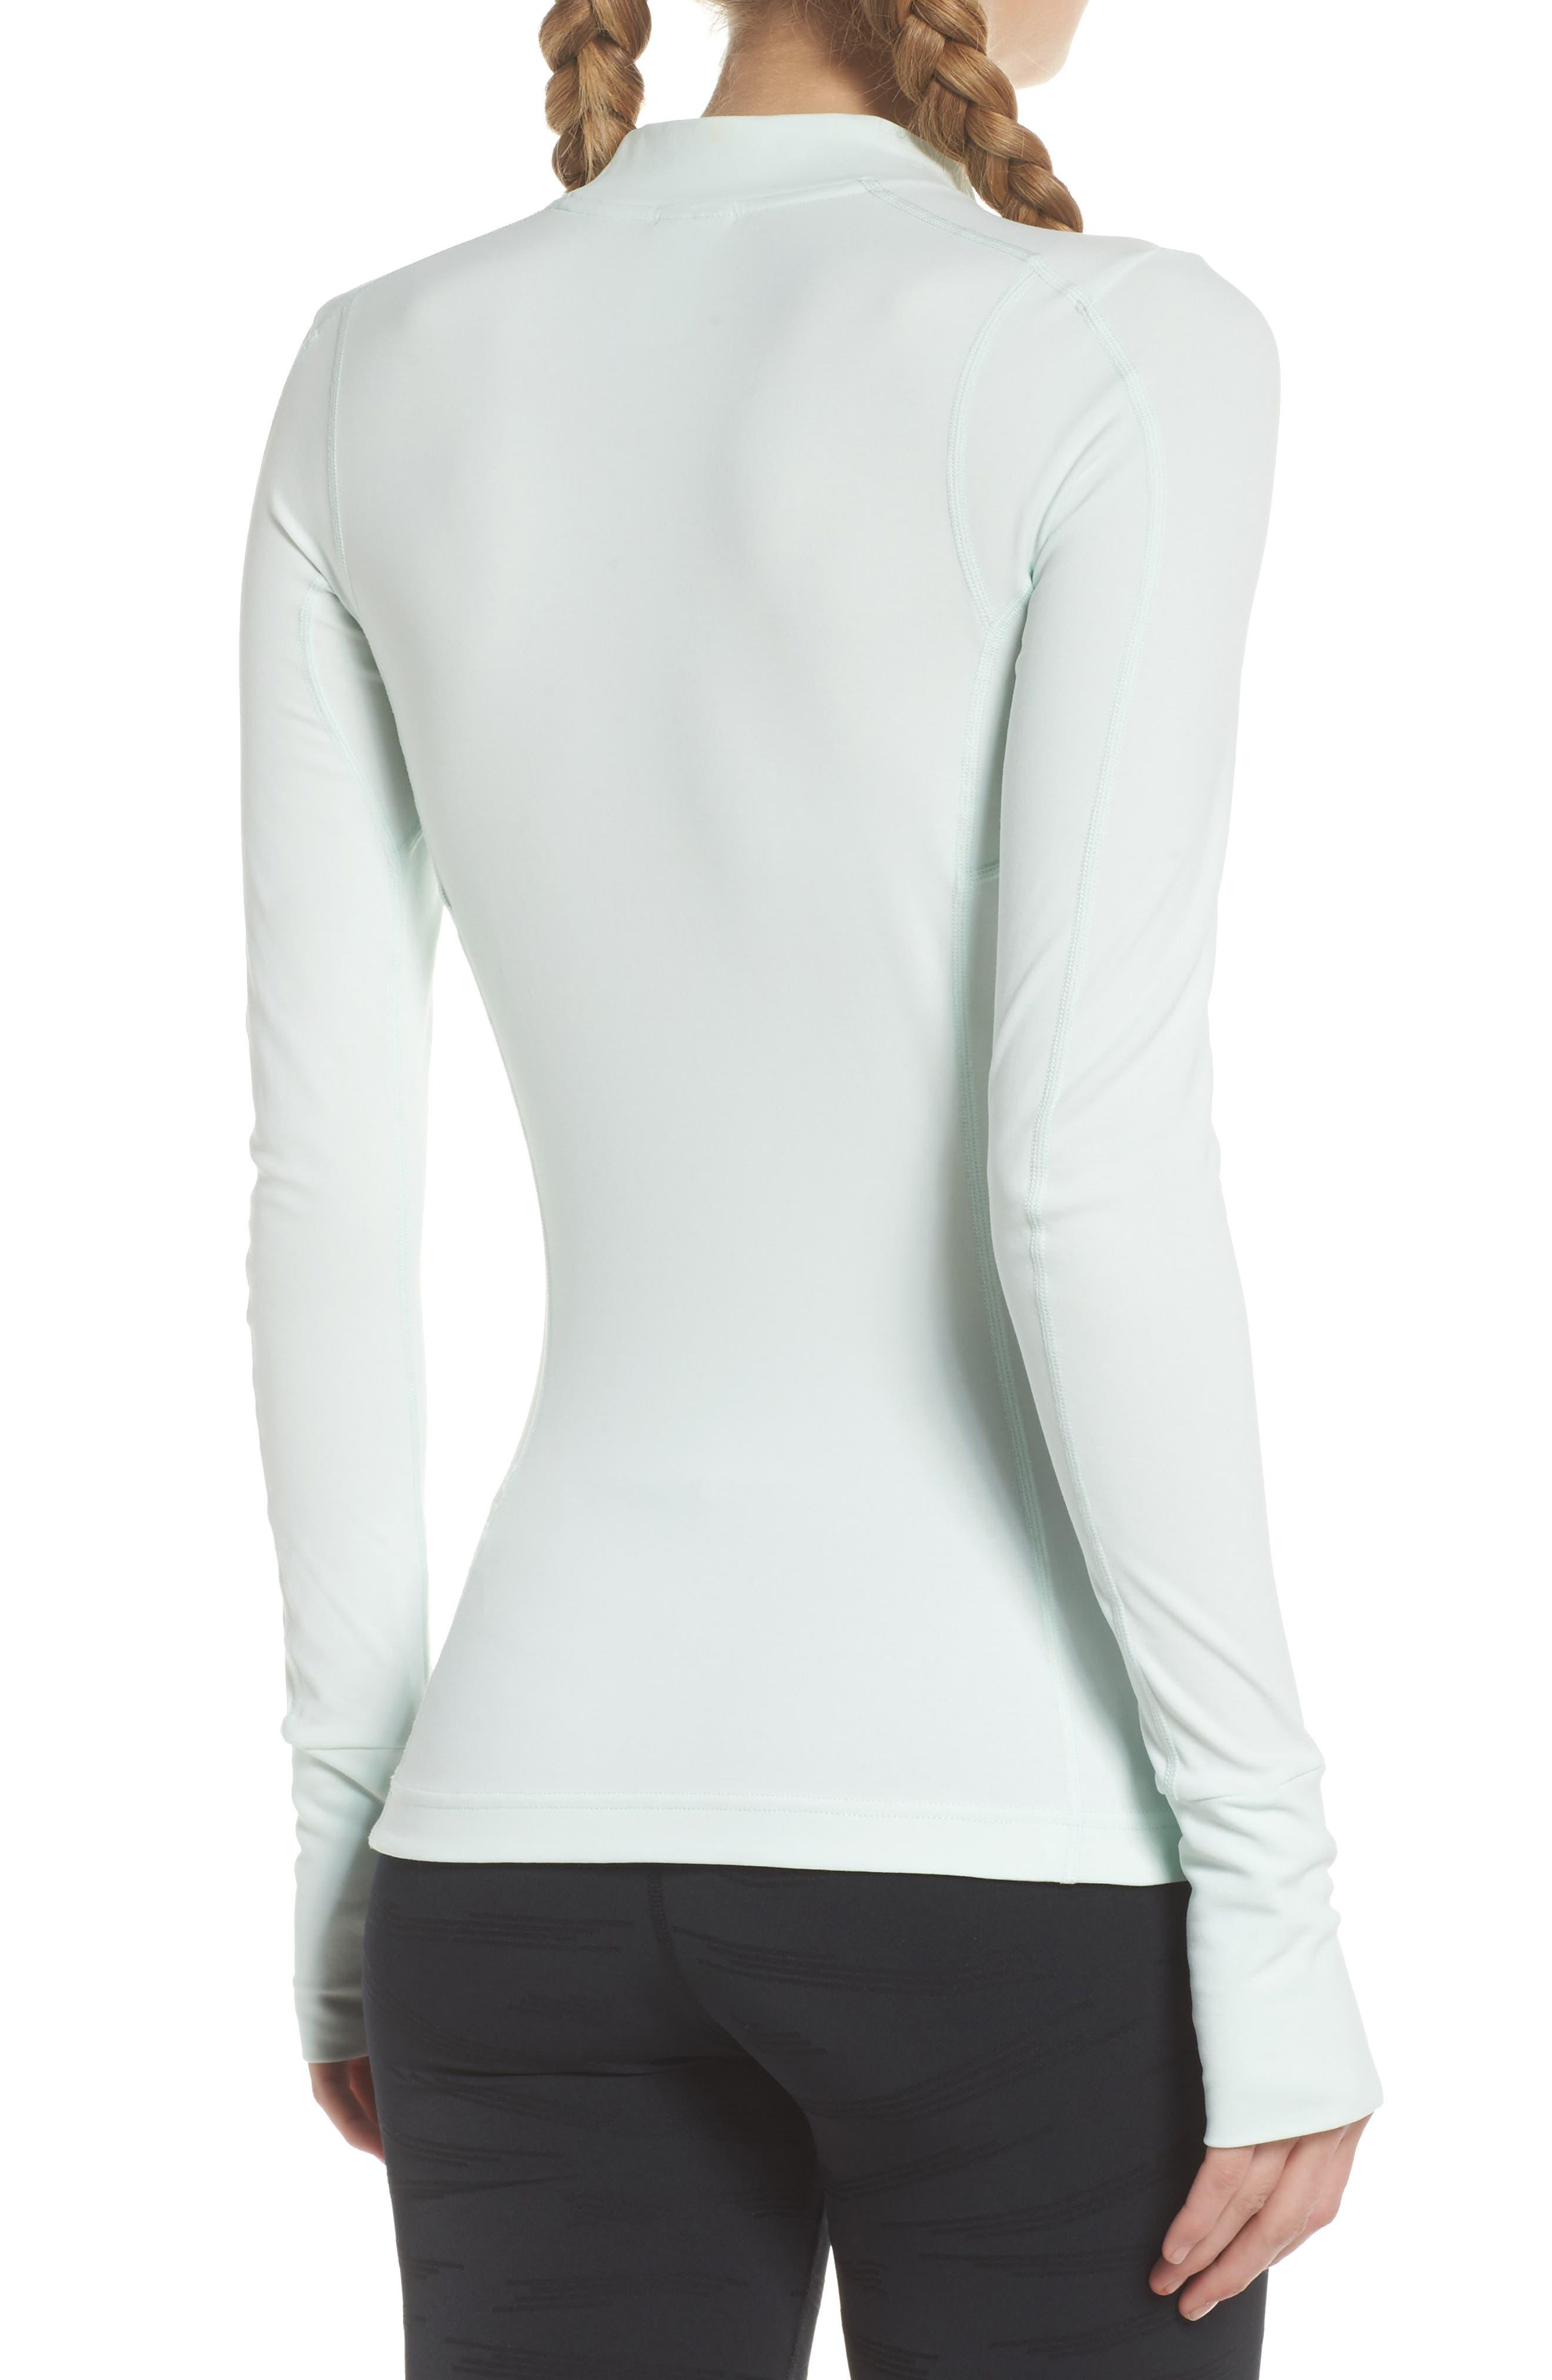 NikeLab ACG Long Sleeve Women's Top,                             Alternate thumbnail 2, color,                             Barely Green/ Black